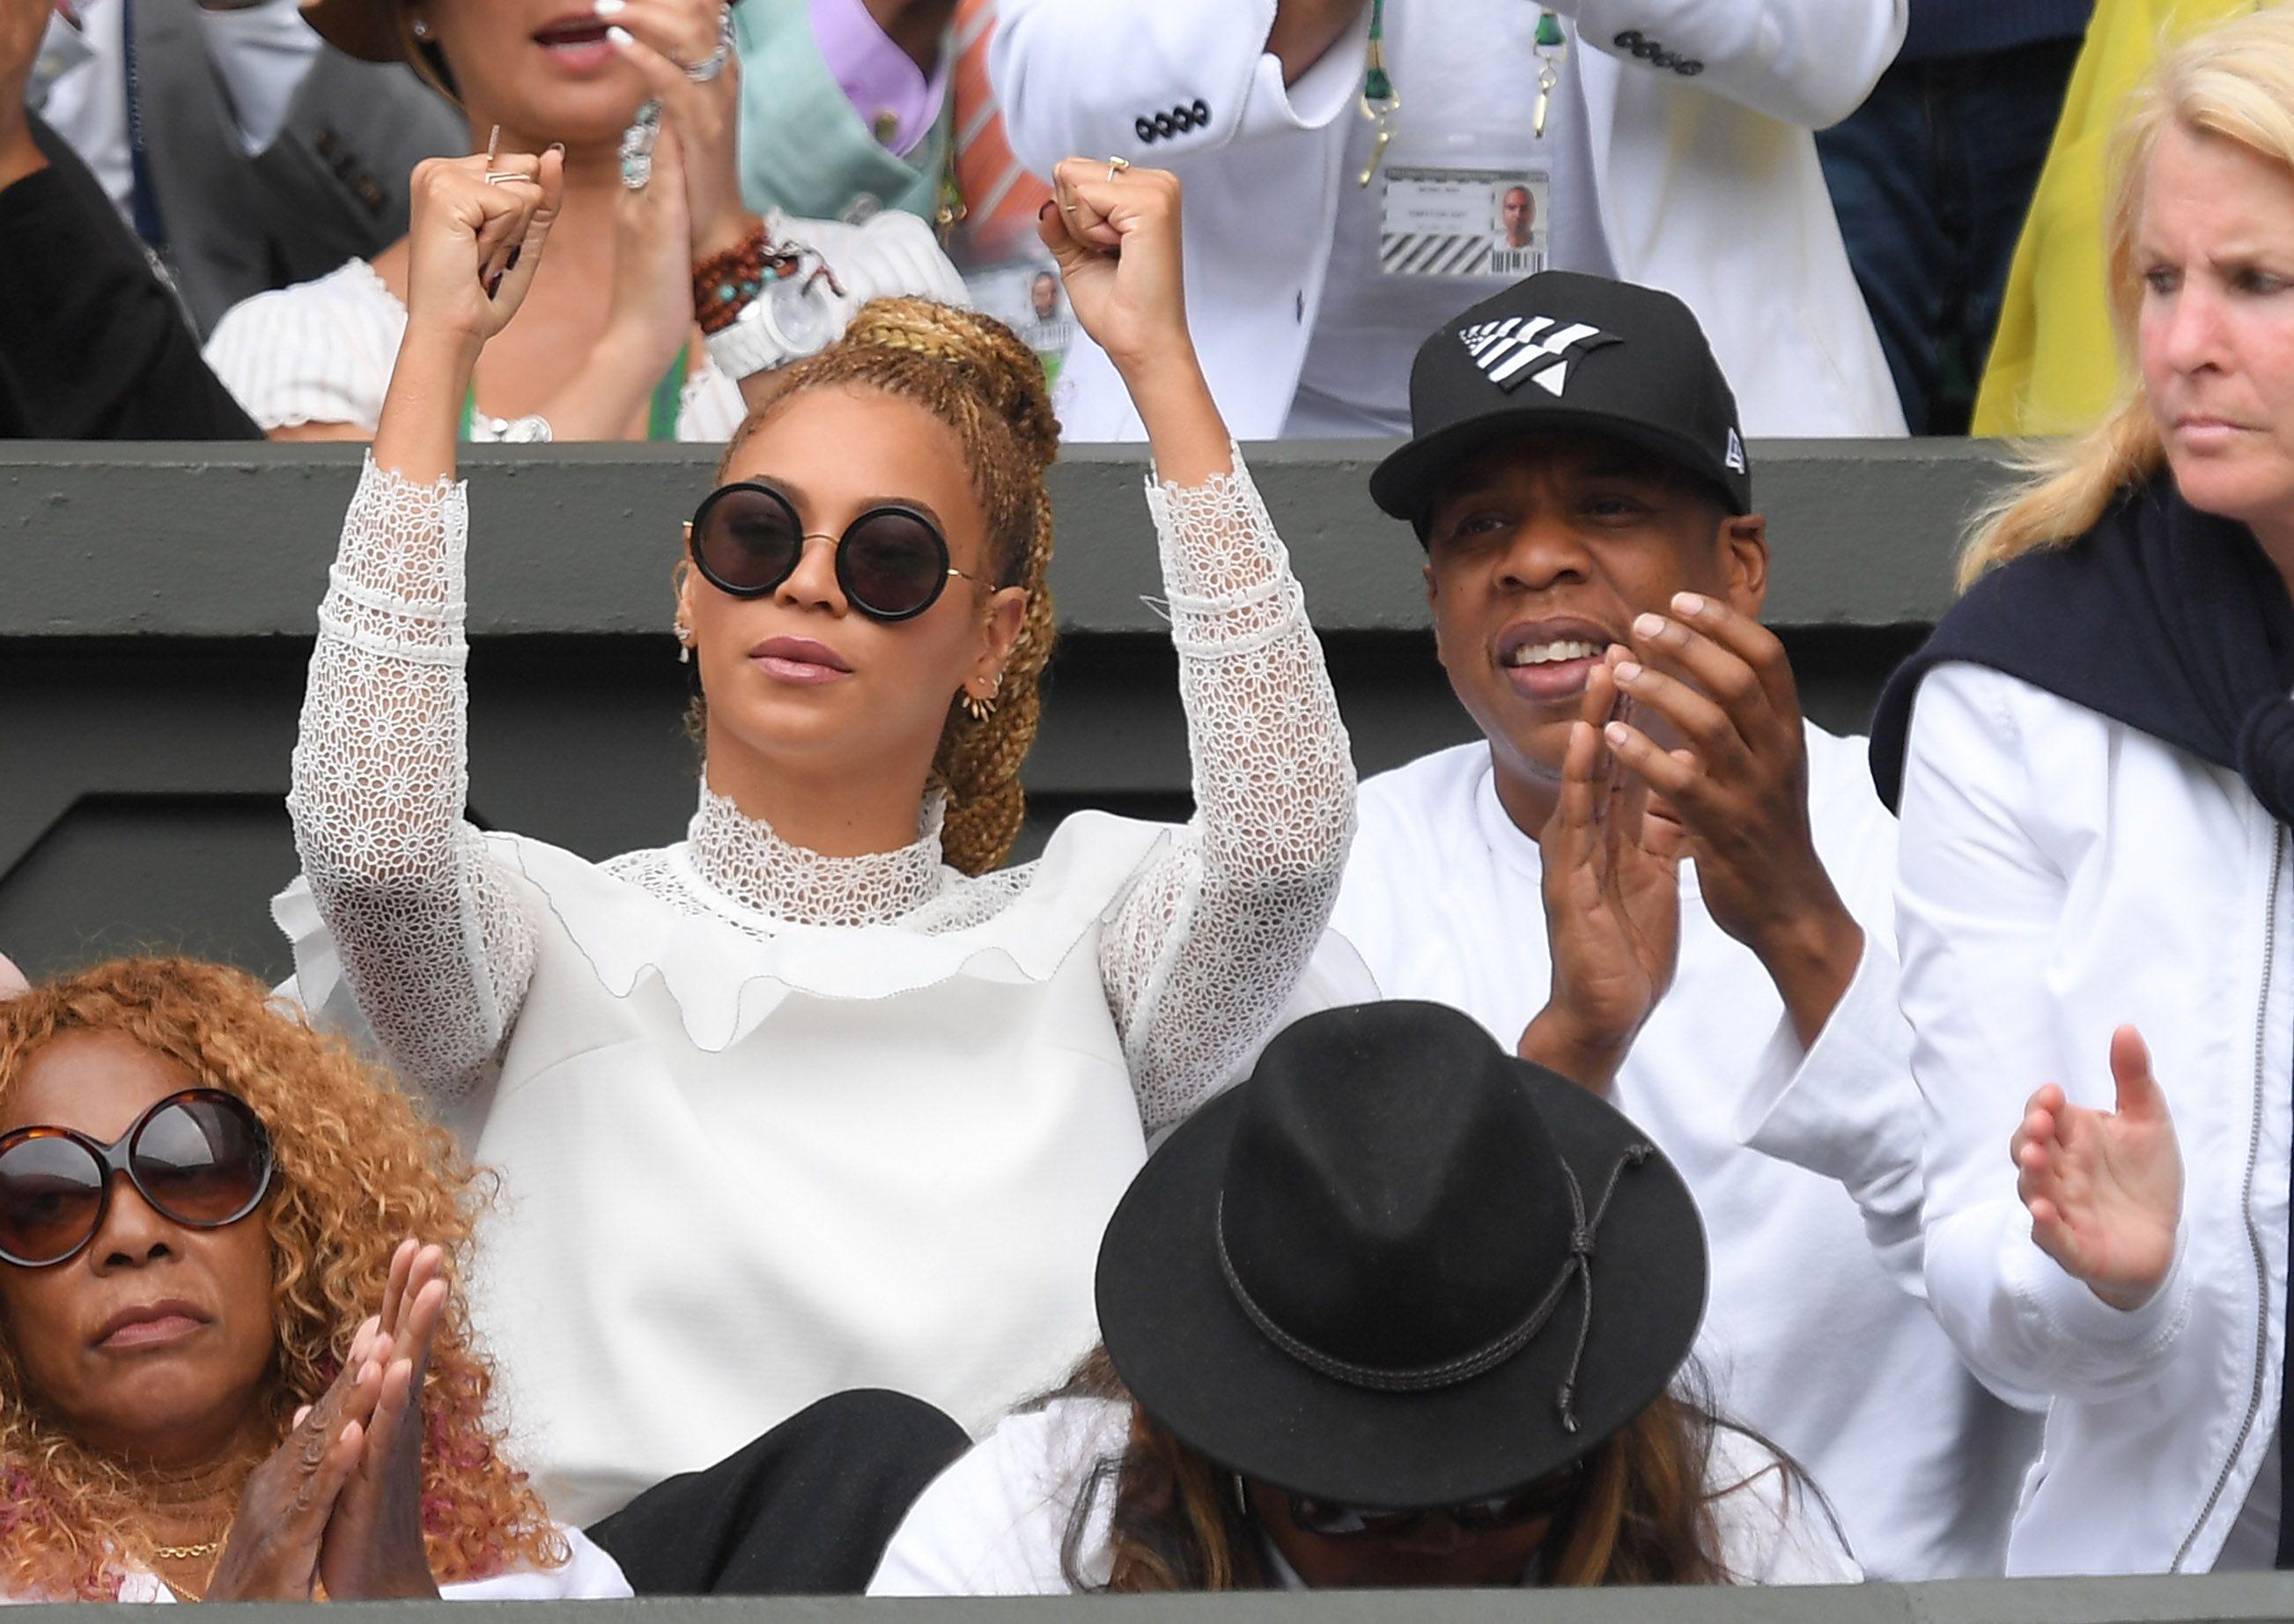 Cara delevigne naked,Lindsay Lohan This Close To Marrying Samantha Ronson, Maybe XXX fotos Sana lantana topless,CelebGate Rachel Cook, Rachel Escudero, Anni Haase, Hannah Murrell Nude Sexy